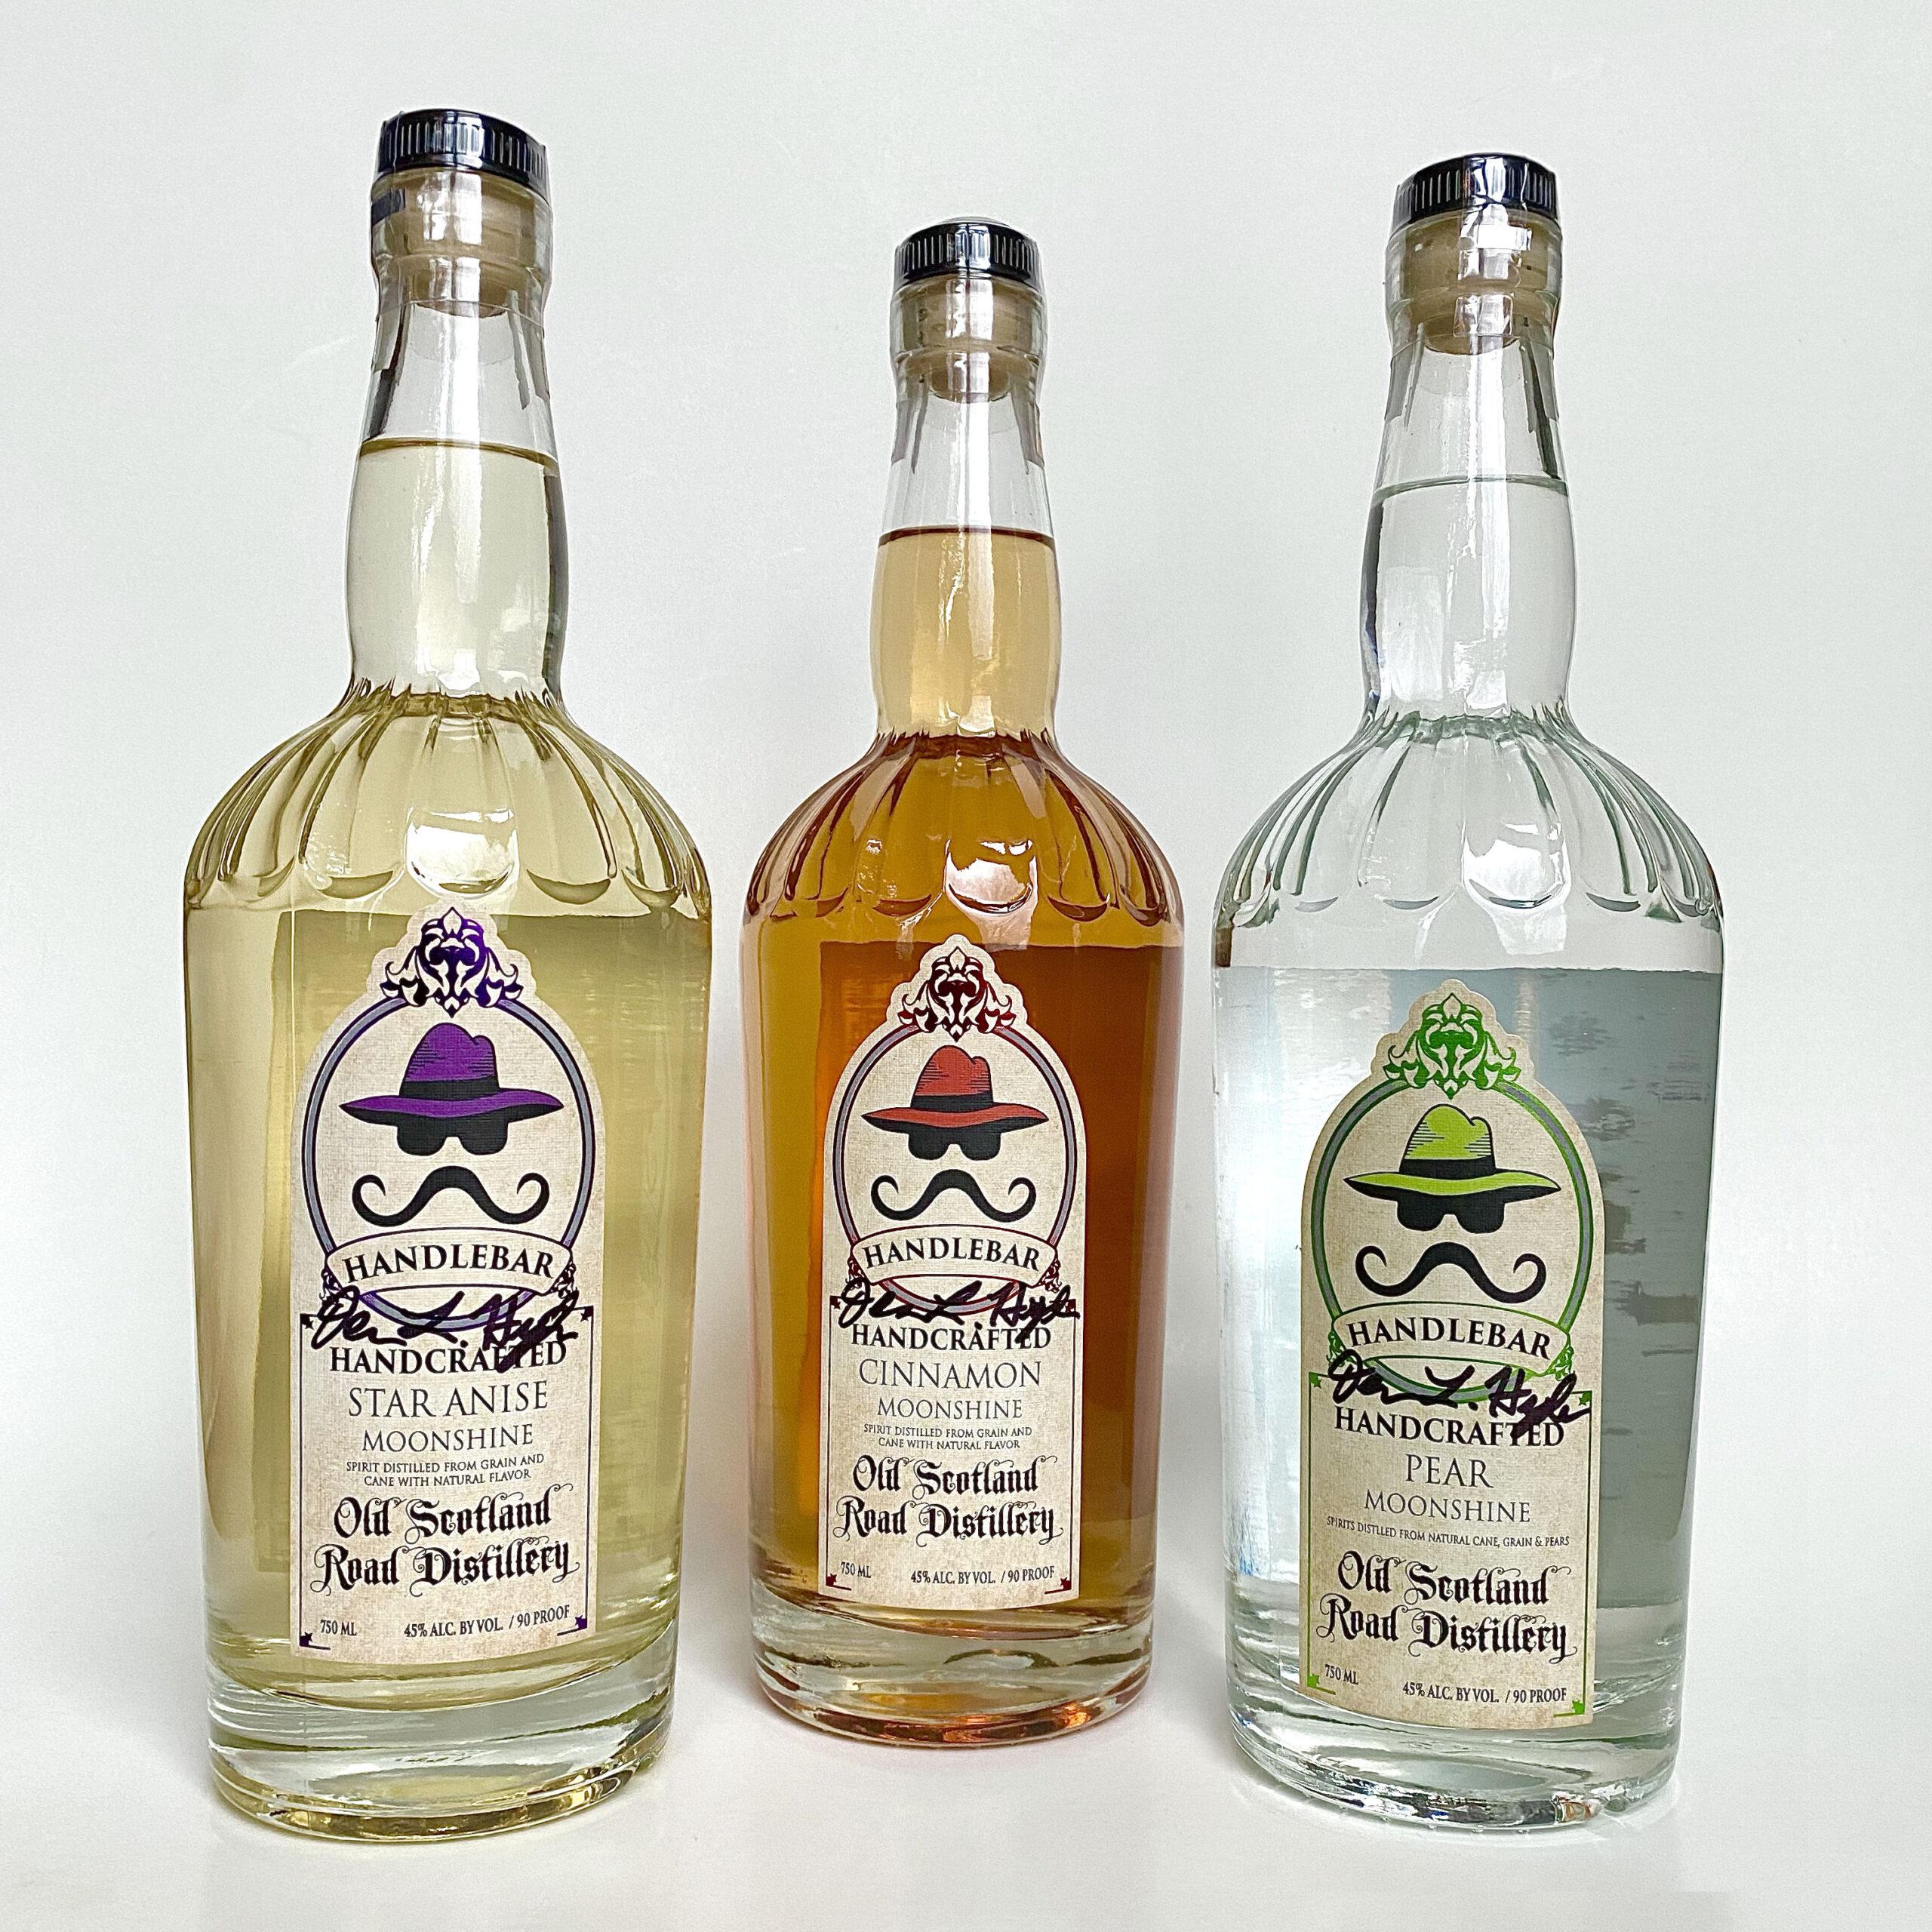 Close-up of White Corn Whiskey Bottle Label